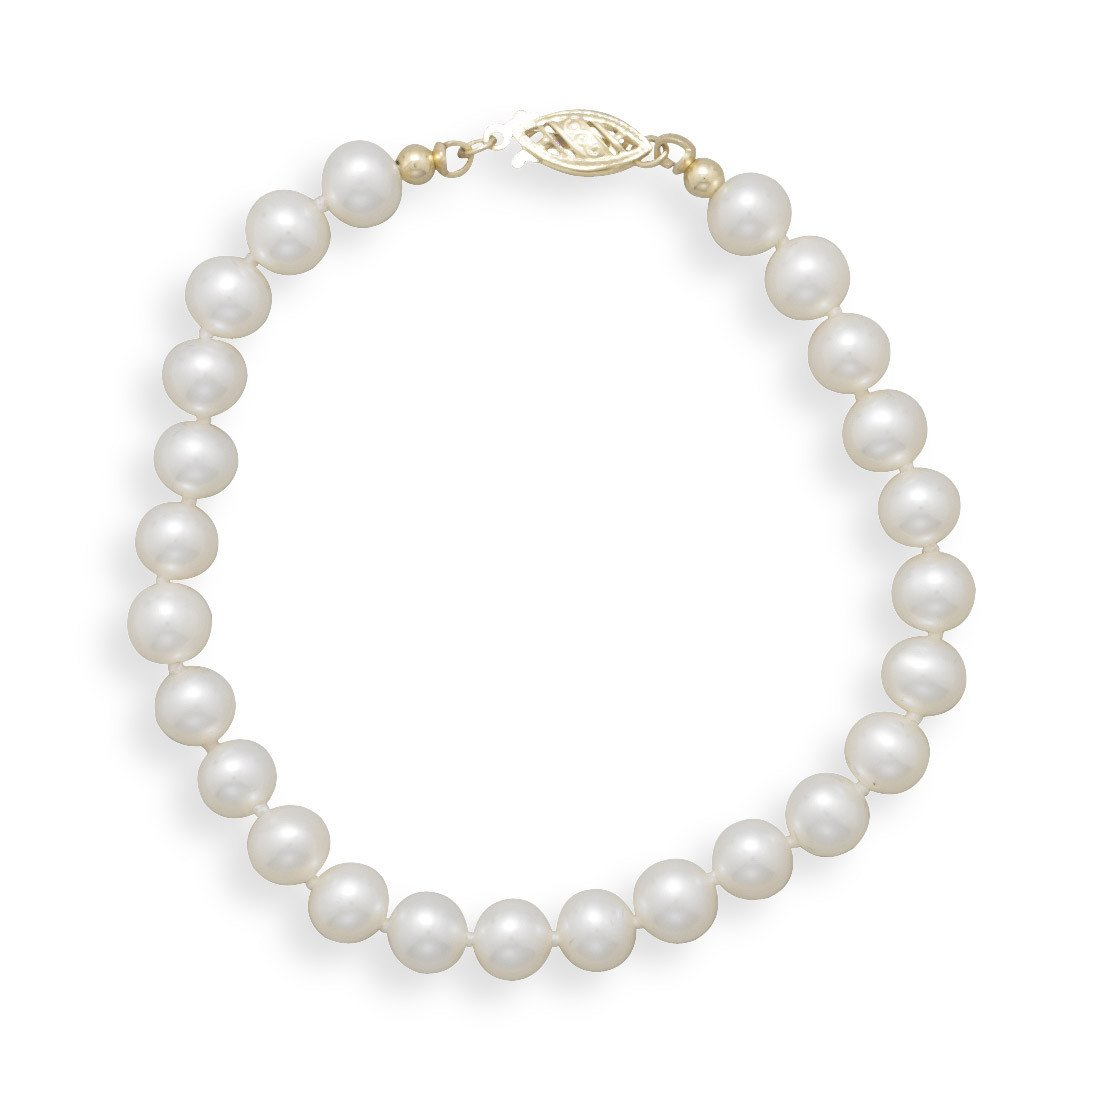 7″ 6-6.5mm Cultured Freshwater Pearl Bracelet